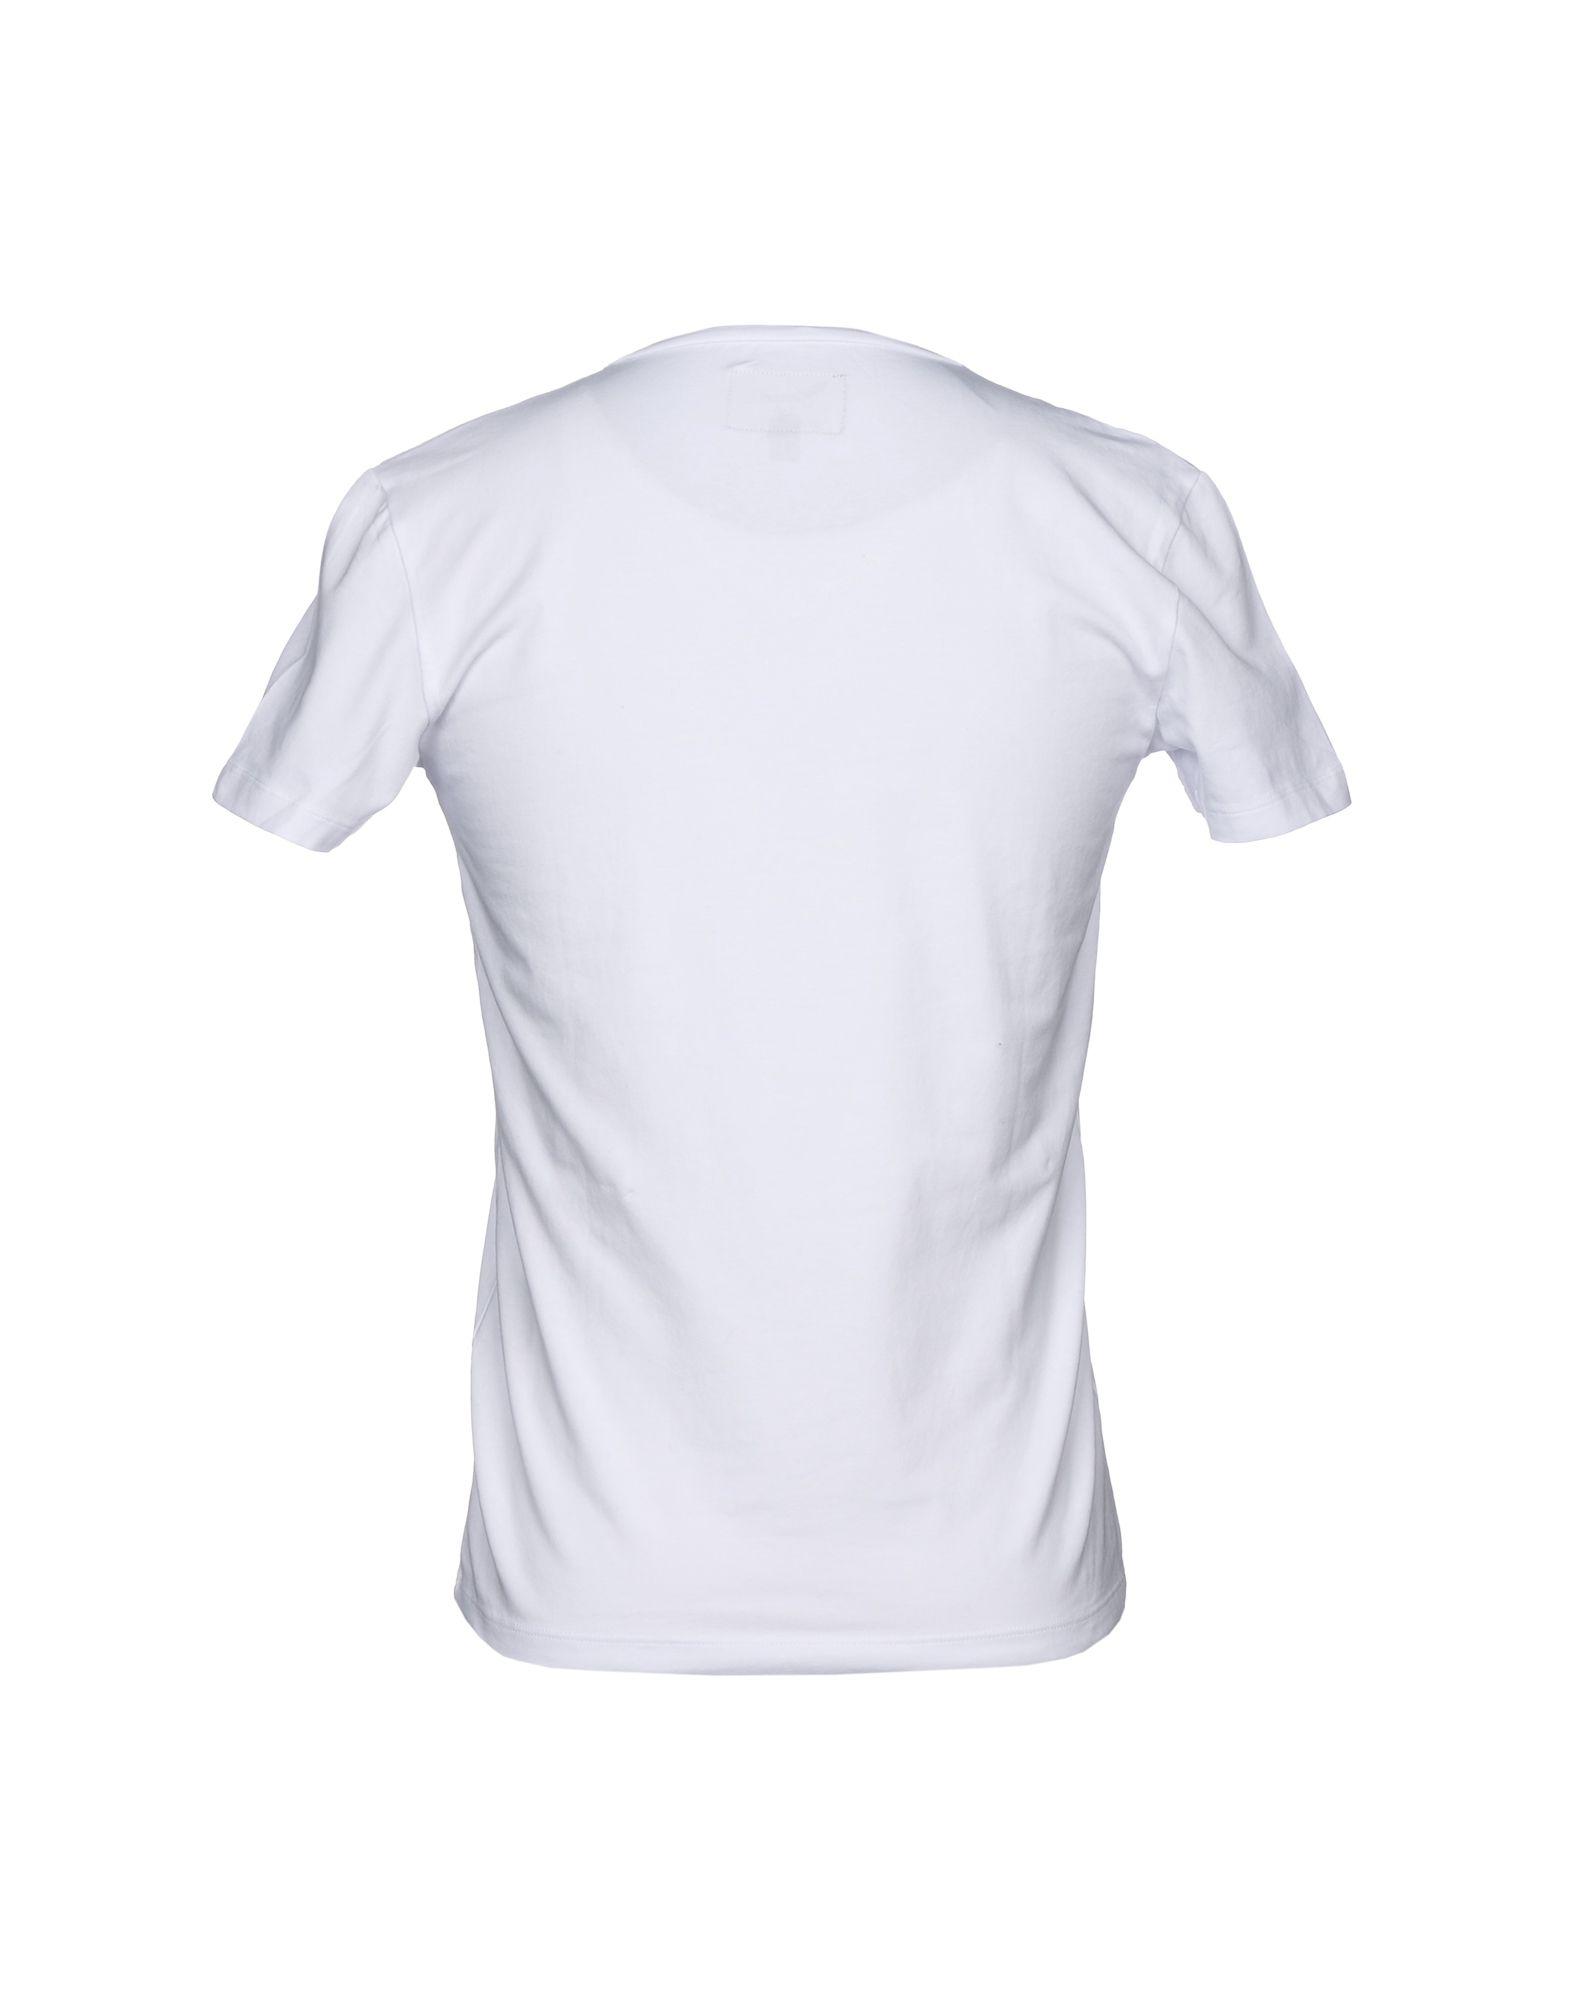 A buon mercato mercato A buon mercato buon T-Shirt Bemover Uomo - 12176244KF 1533e7